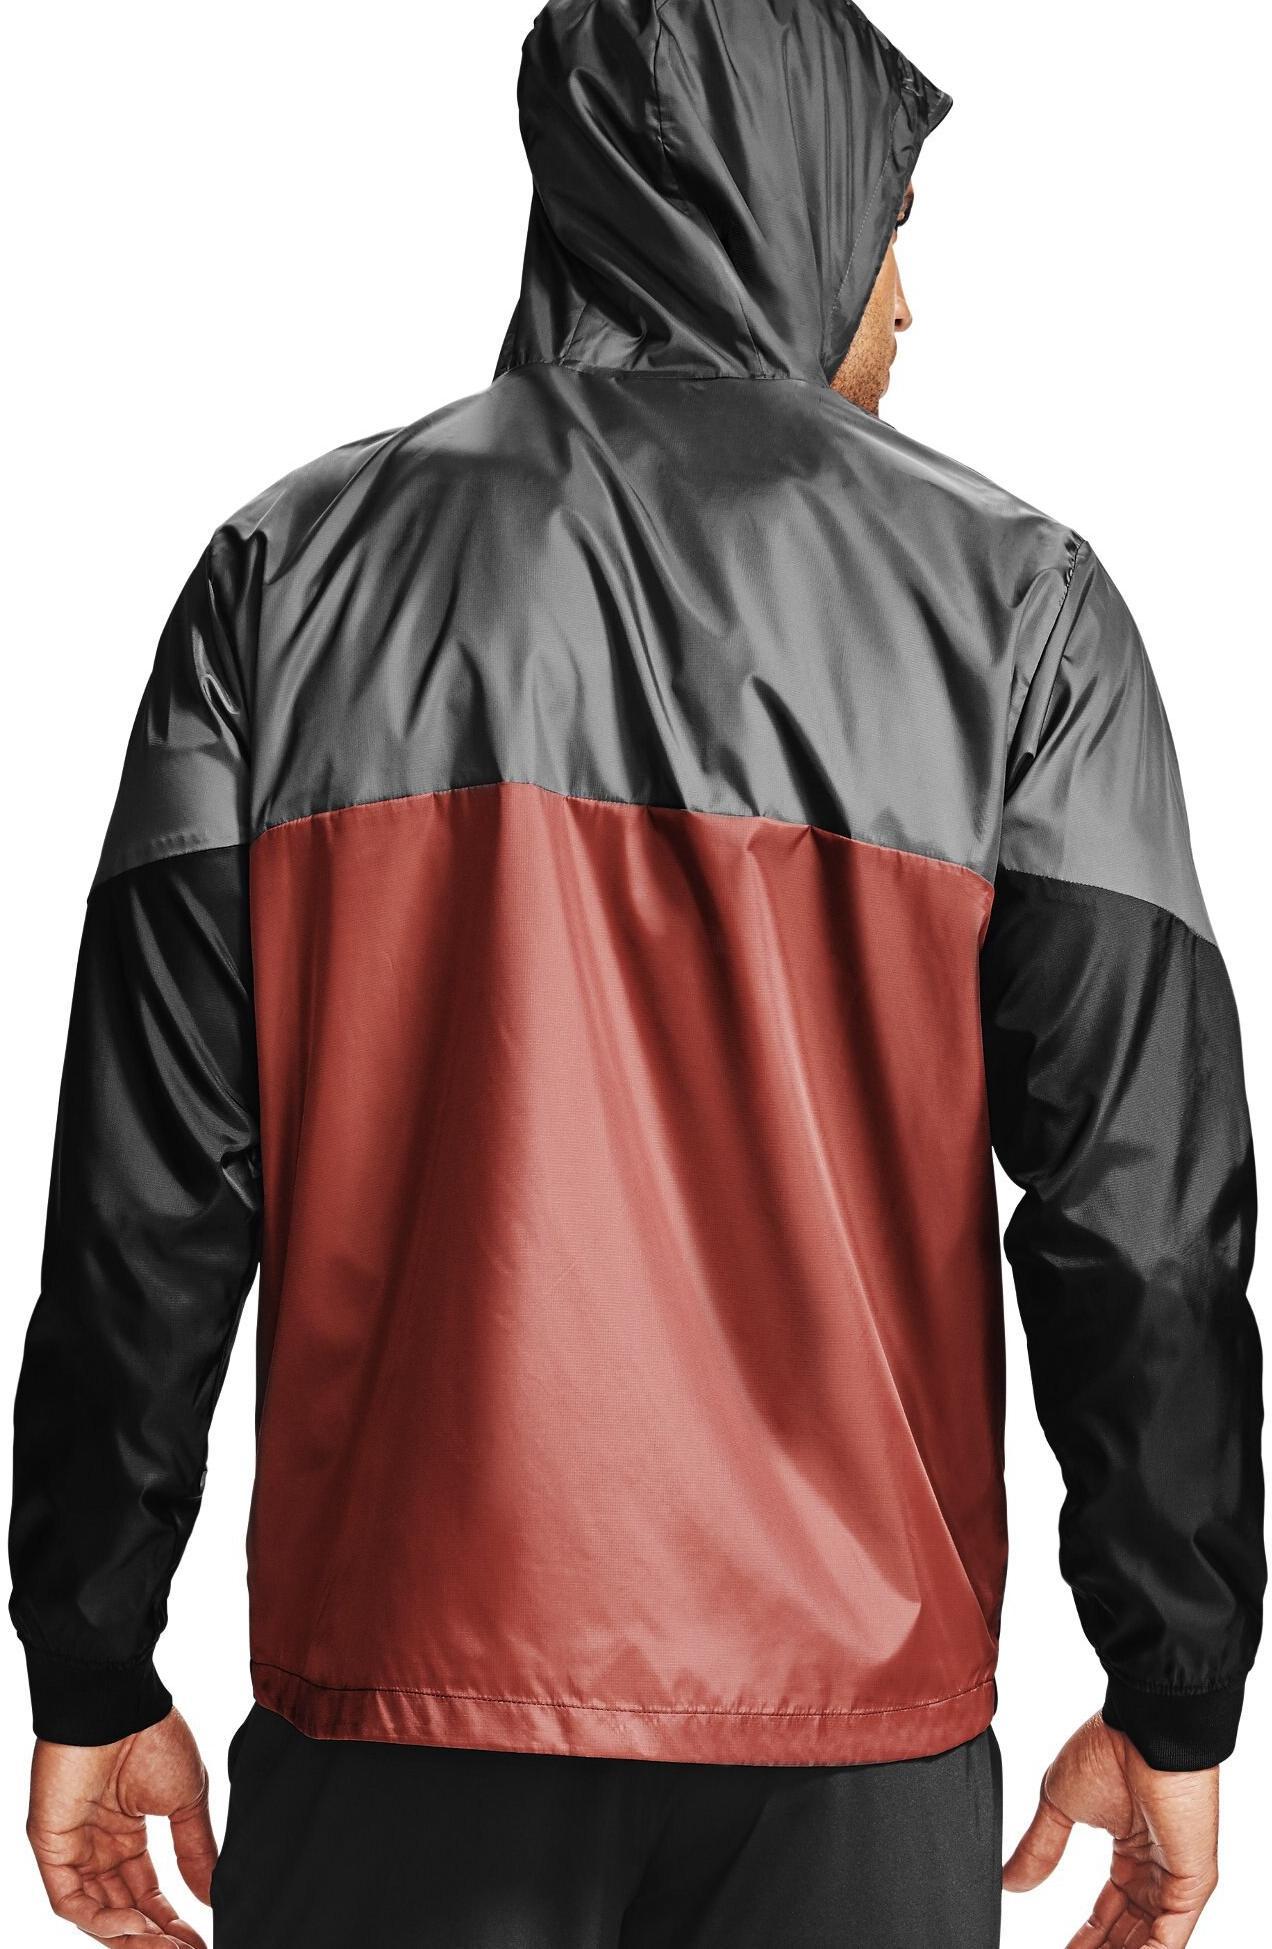 Under Armour Men/'s UA Legacy Windbreaker Jacket 1345405